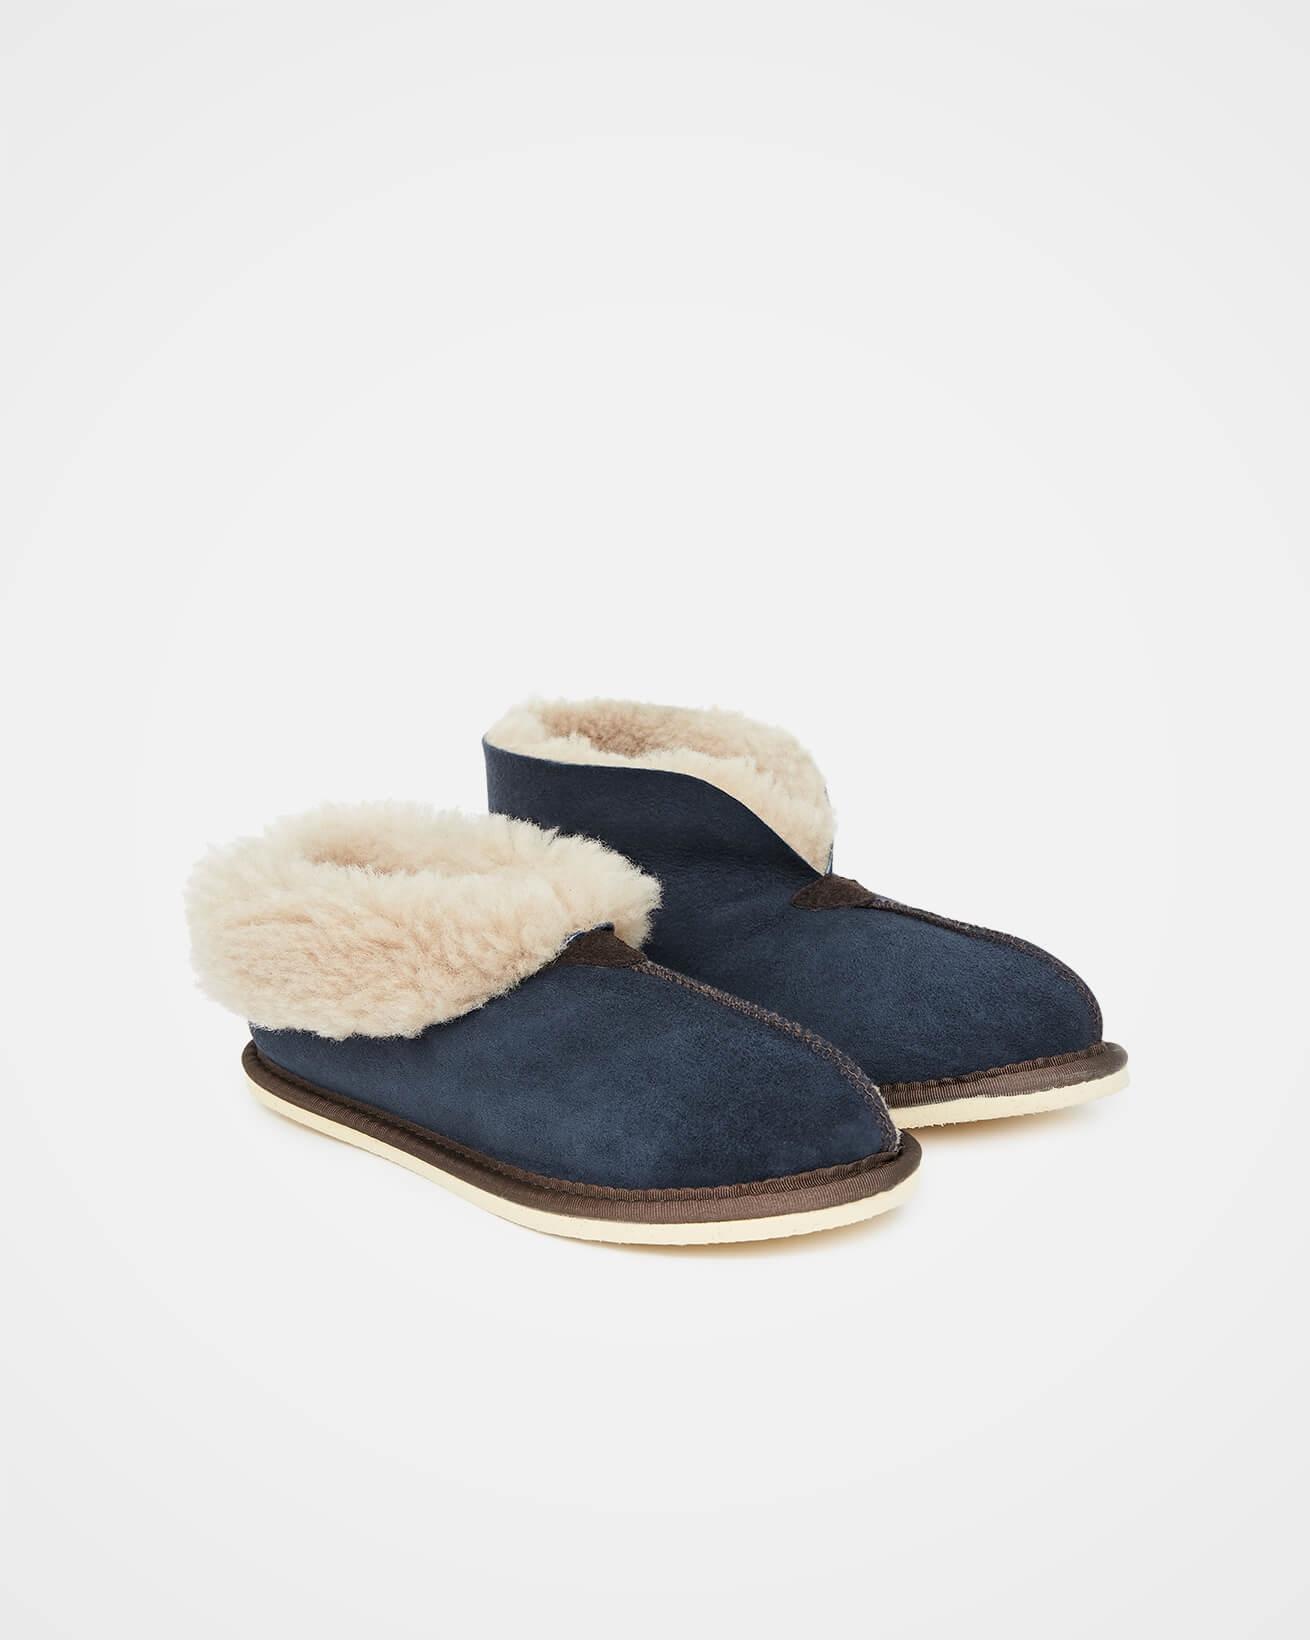 2100_ladies-sheepskin-bootee-slippers_blue-iris_pair-2_v2_web.jpg